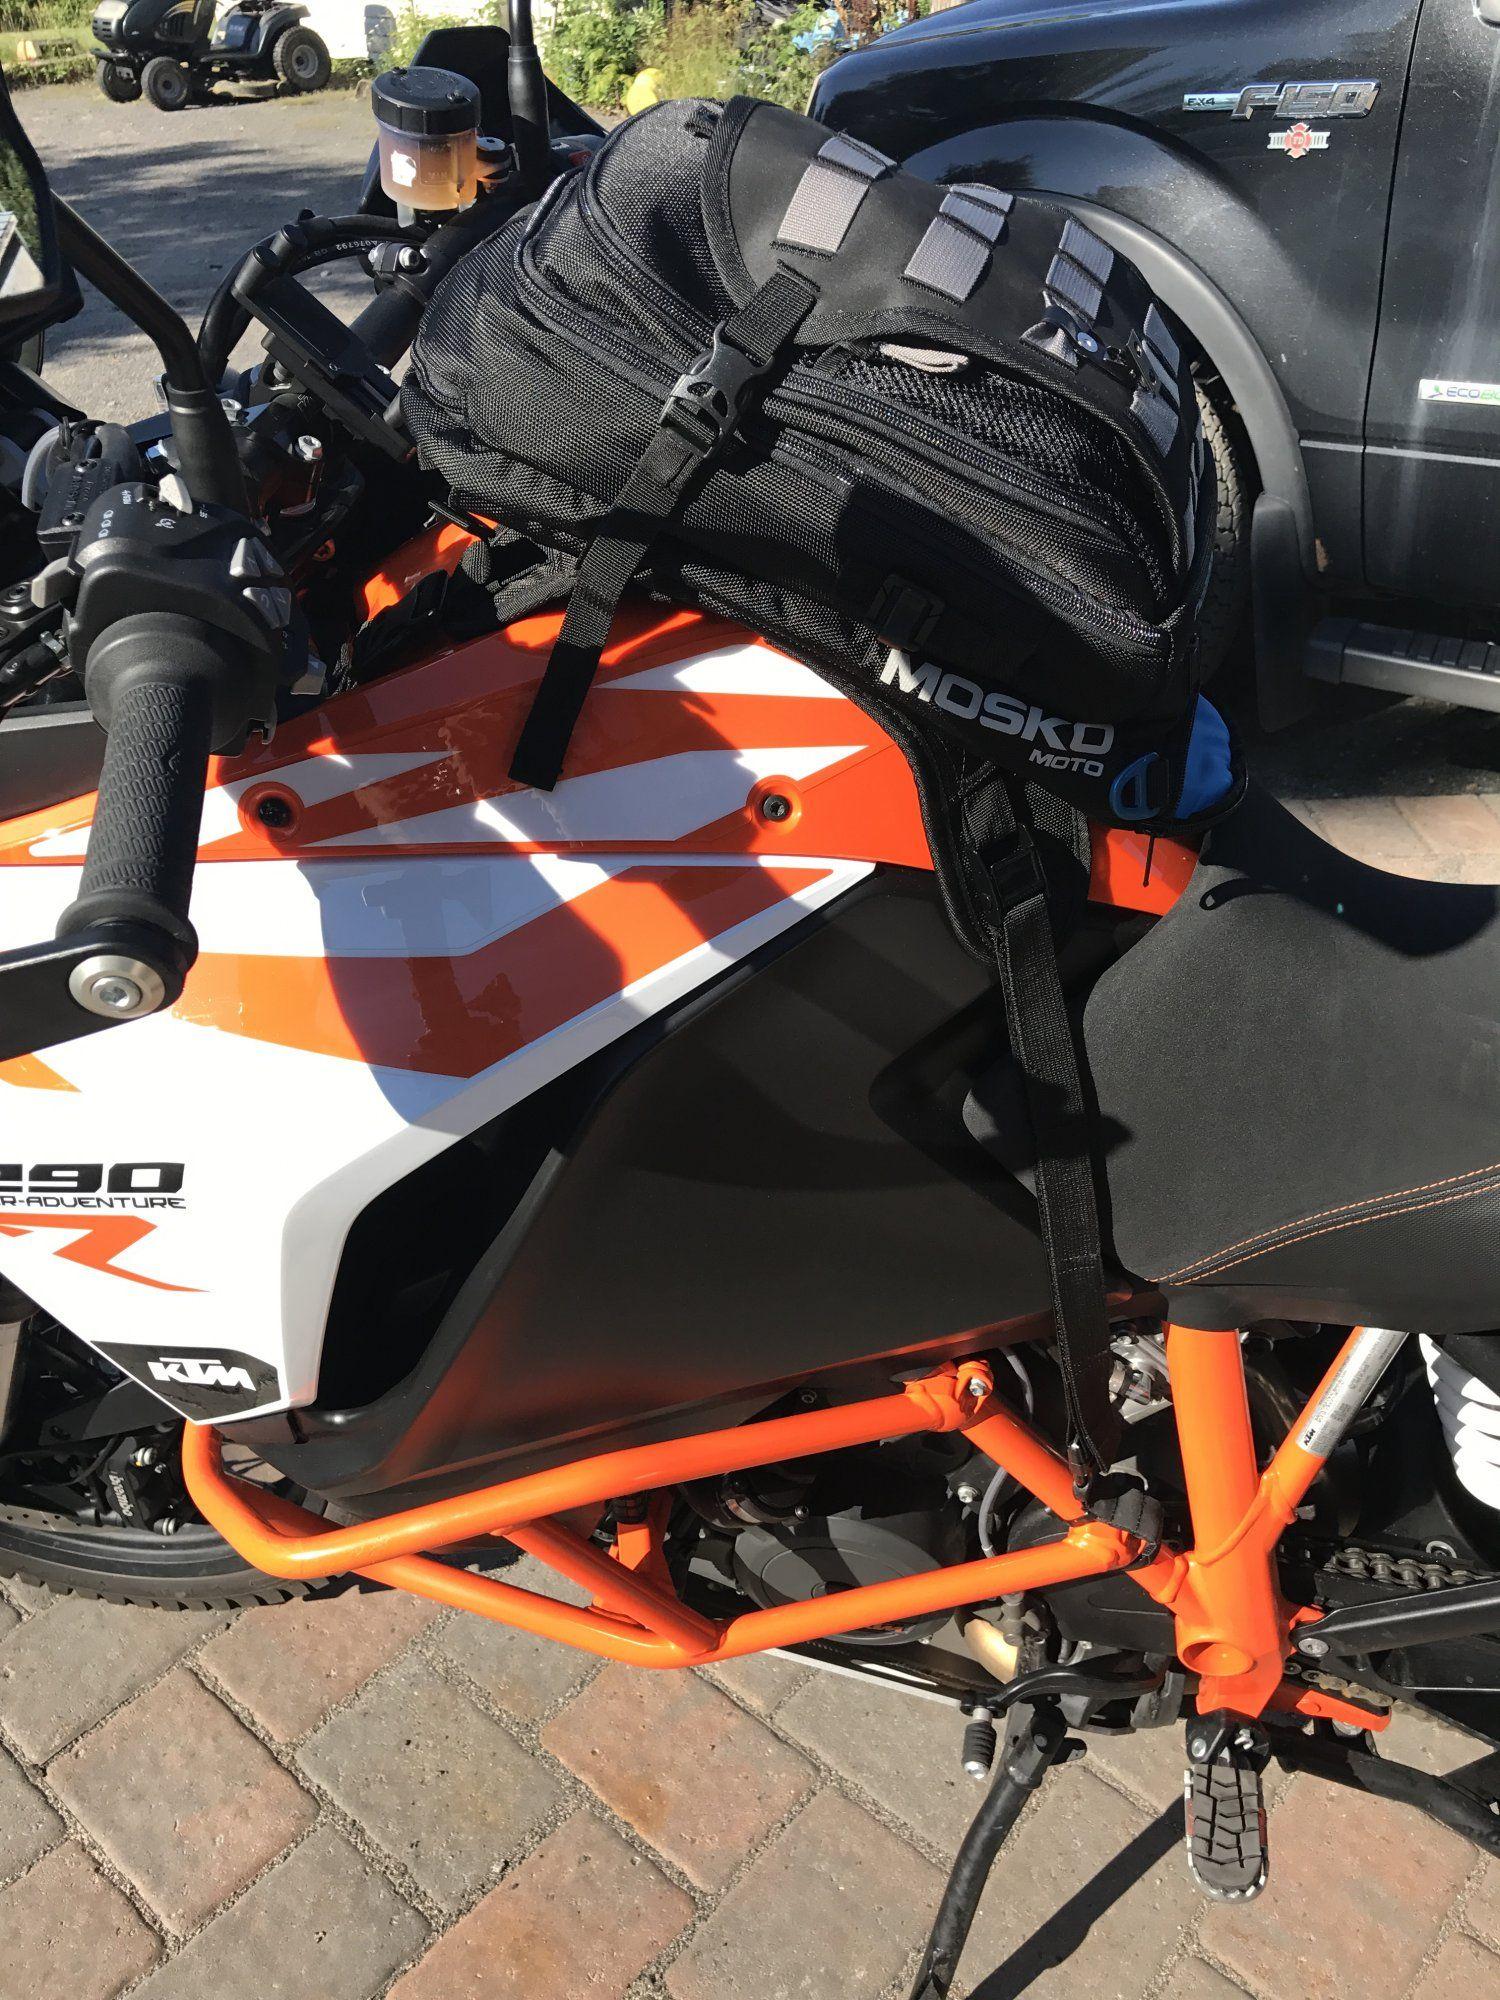 Mosko Moto Nomad Tank Bag on KTM 1290 Super Adventure R